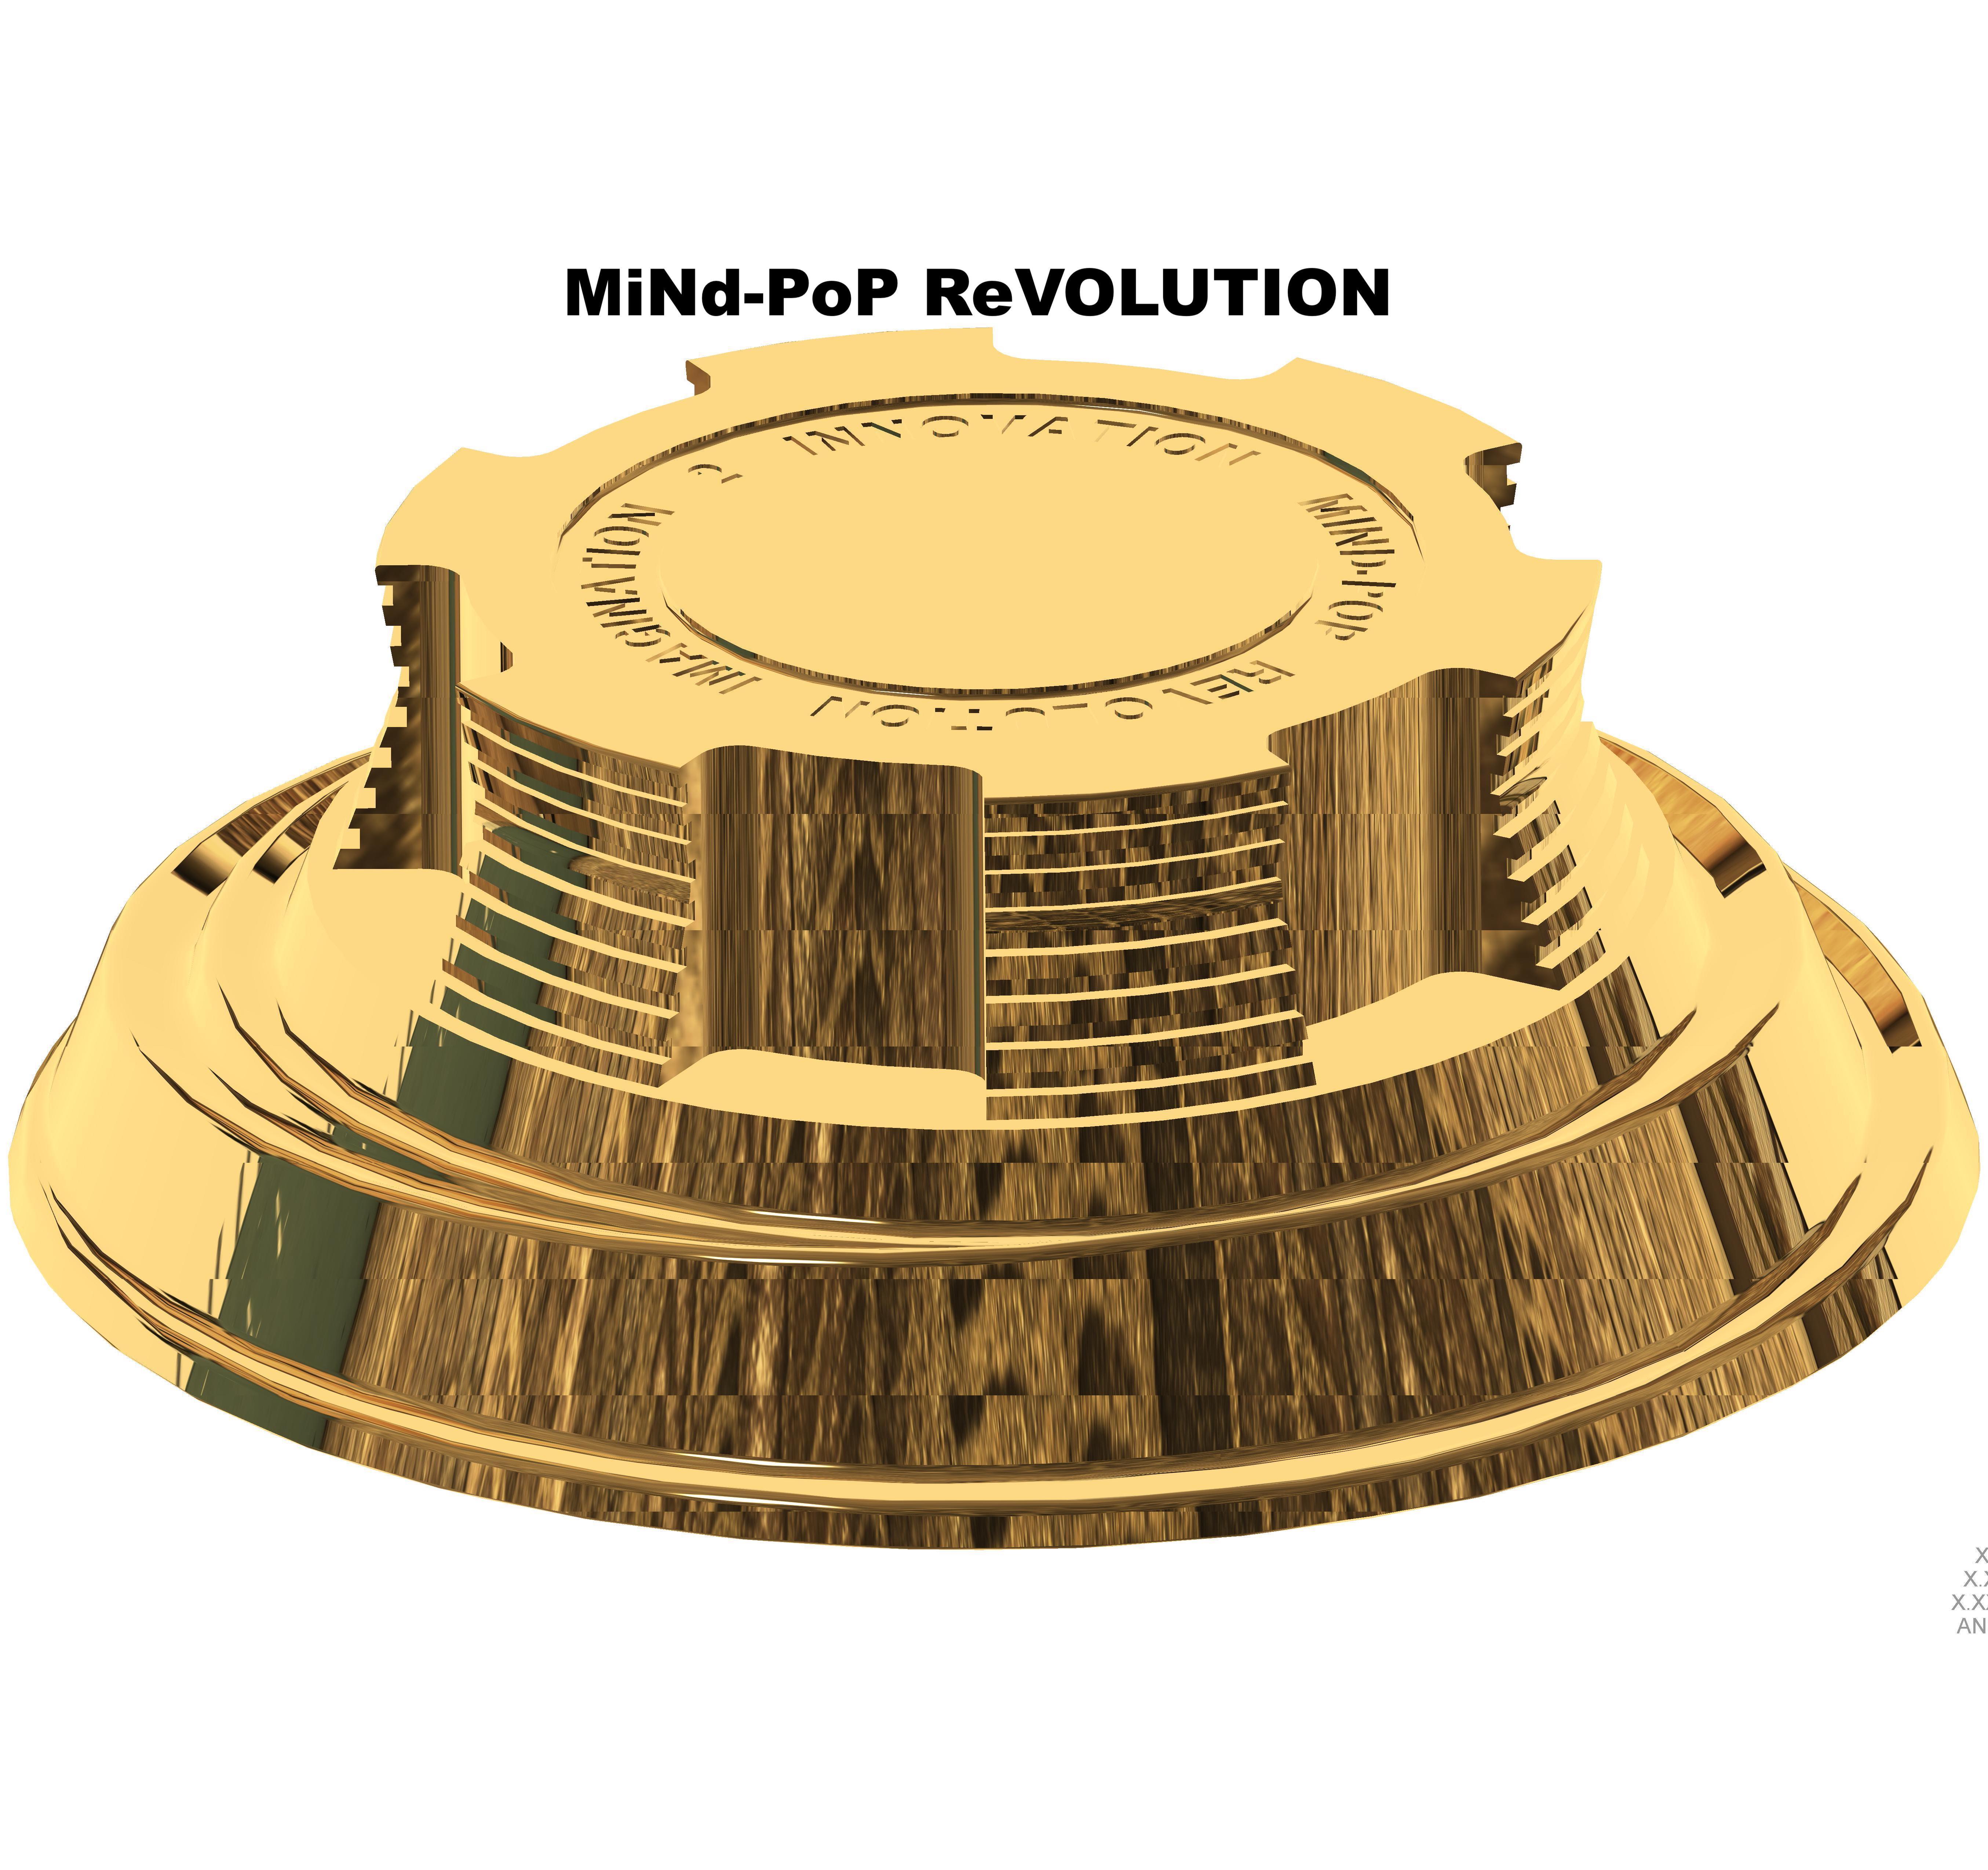 mindpoprevolution's avatar